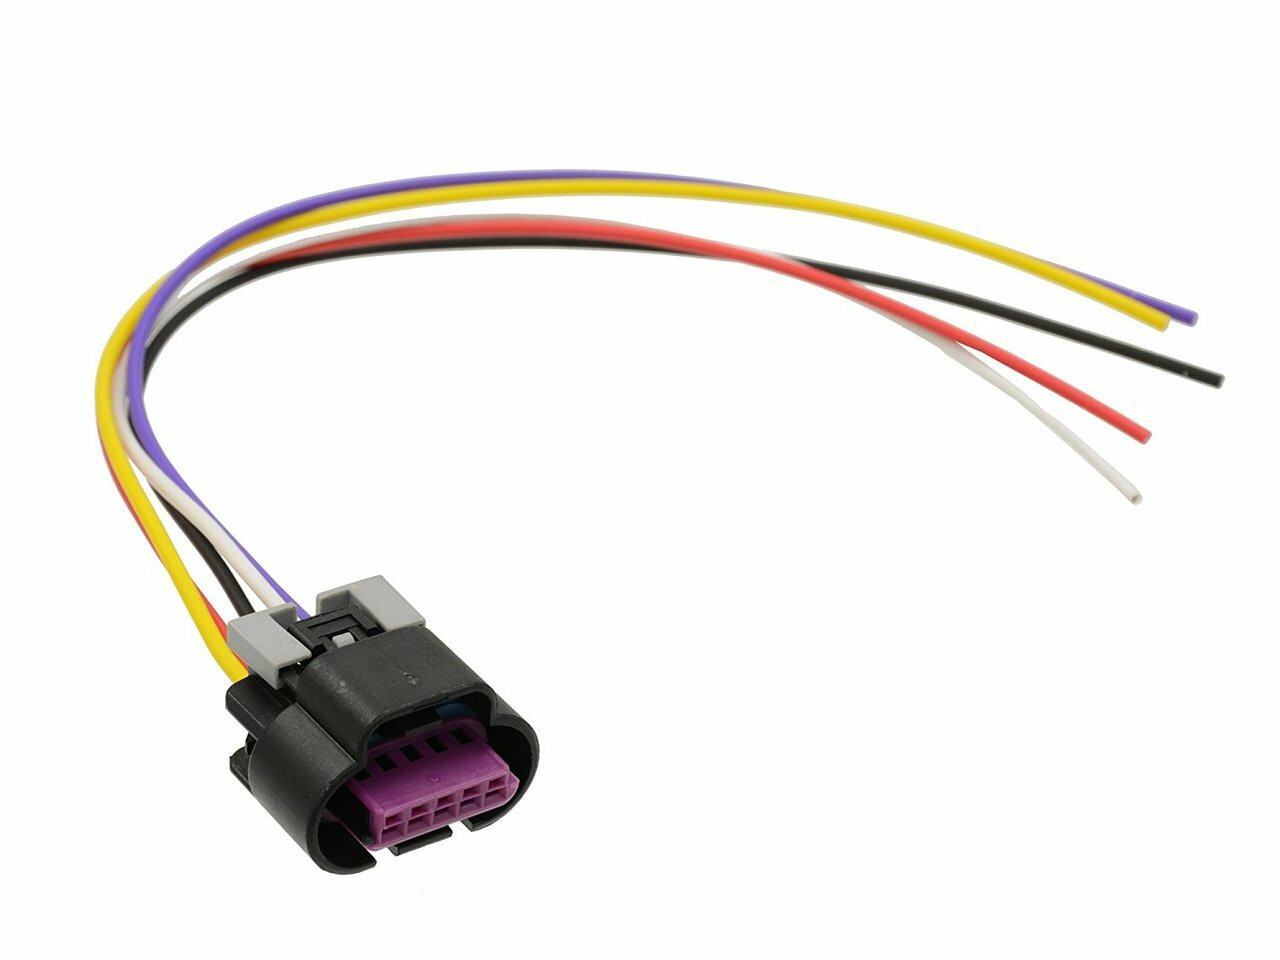 gm 5 wire mass air flow maf sensor connector pigtail ls2 ls1 lq4 4 8l  [ 1280 x 960 Pixel ]